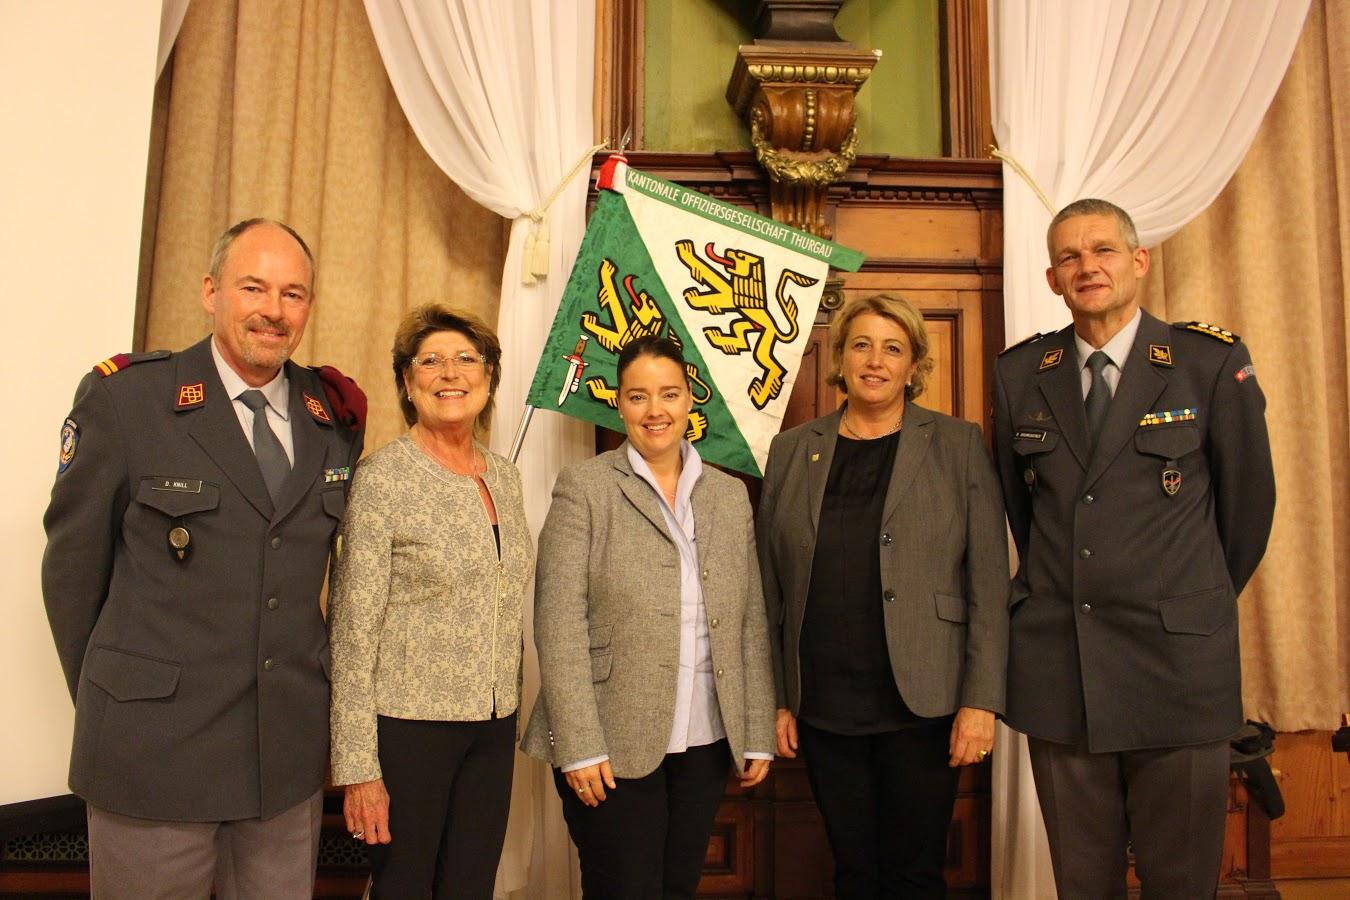 GV der kantonalen Offiziersgesellschaft Thurgau 2017